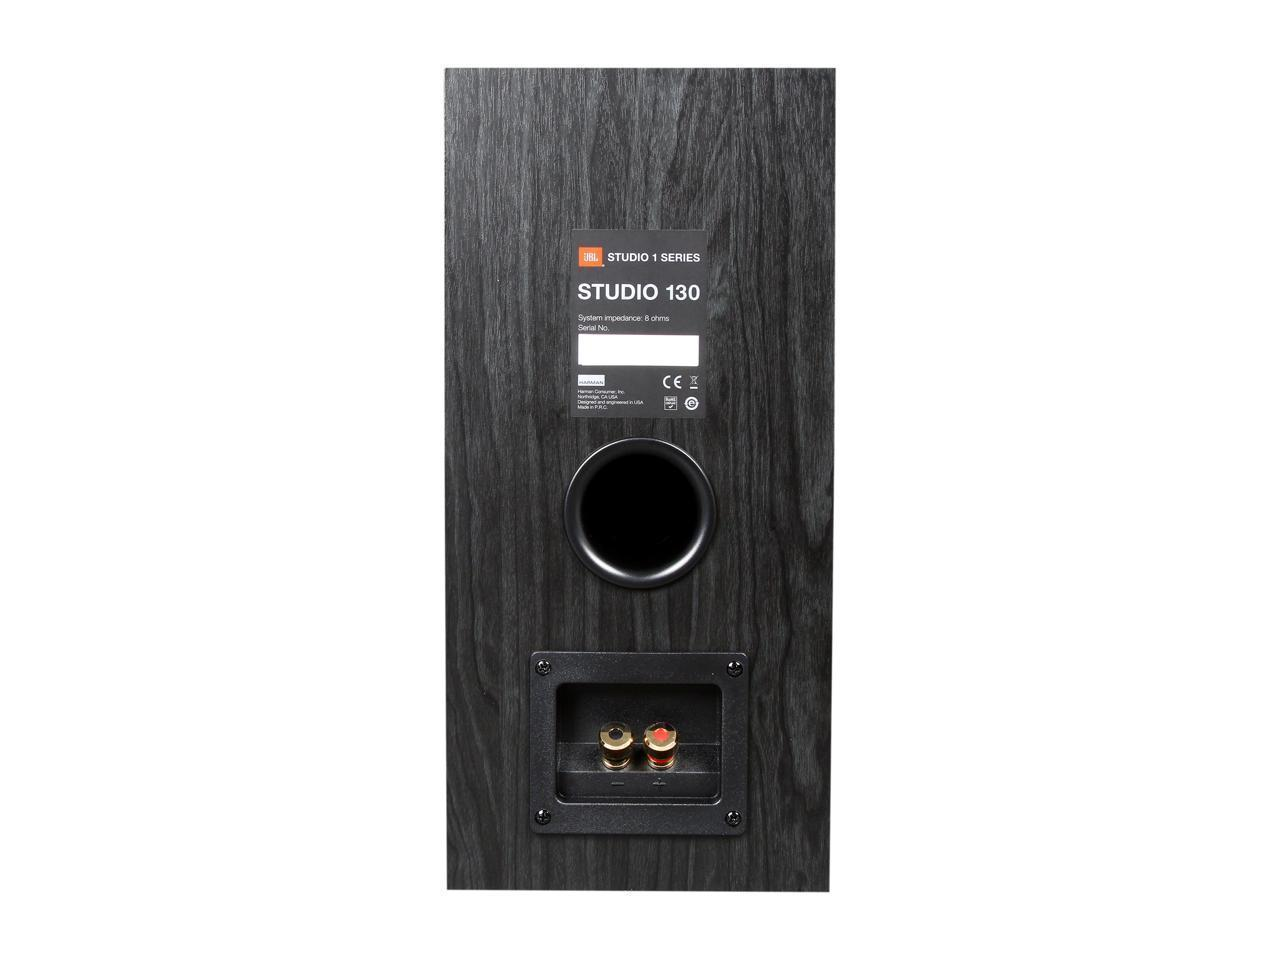 (PAIR )JBL Studio 1 Series Studio 130 Home Audio Speaker image 6